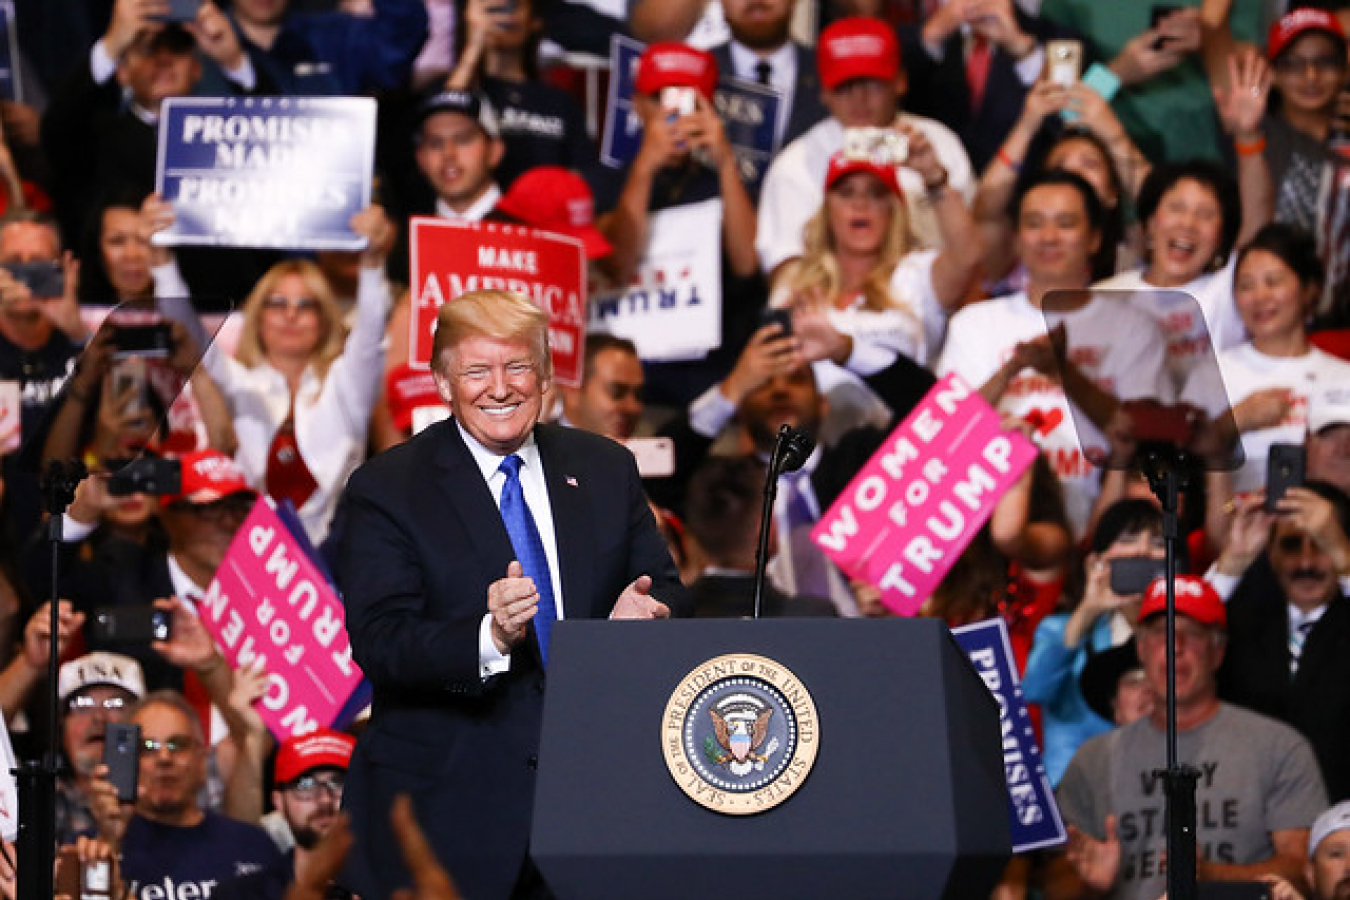 Trump MAGA rally in Las Vegas